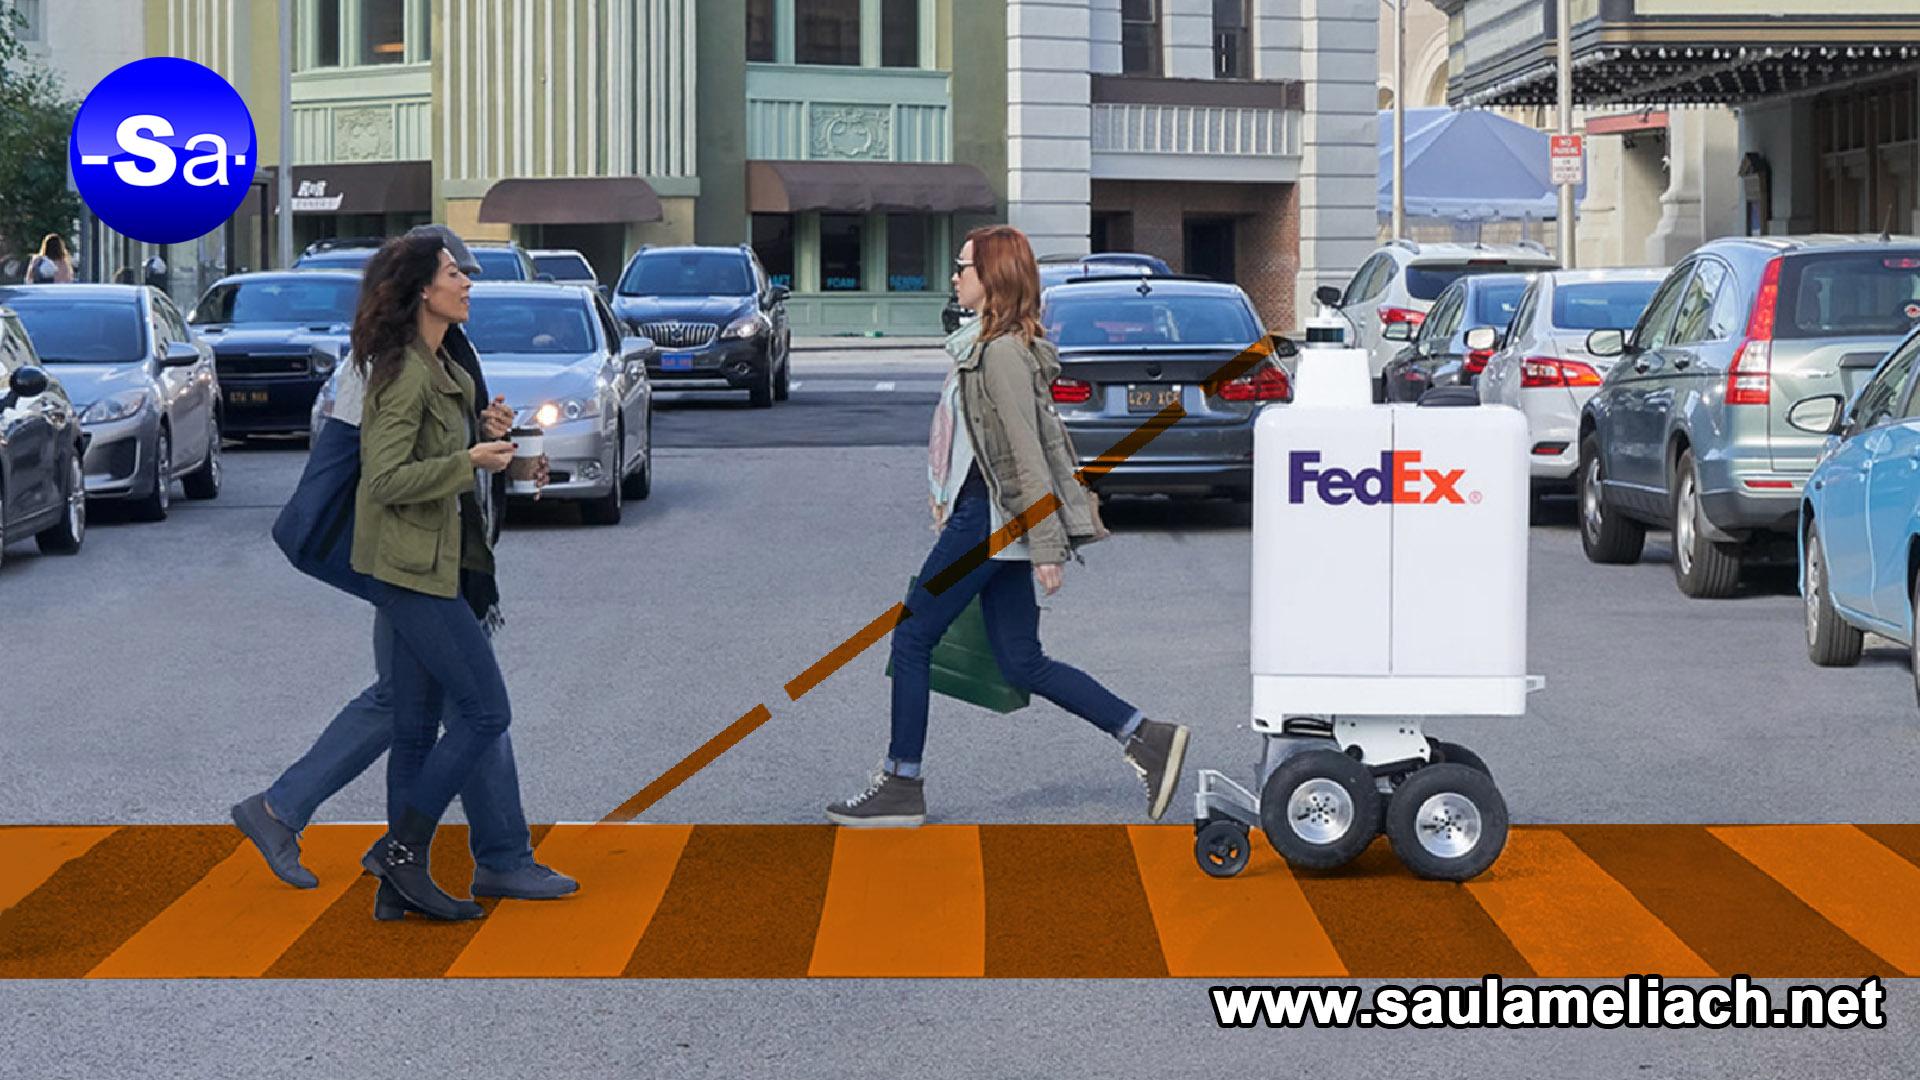 saulameliach - FedEx implementará robots para entregas a domicilio 2